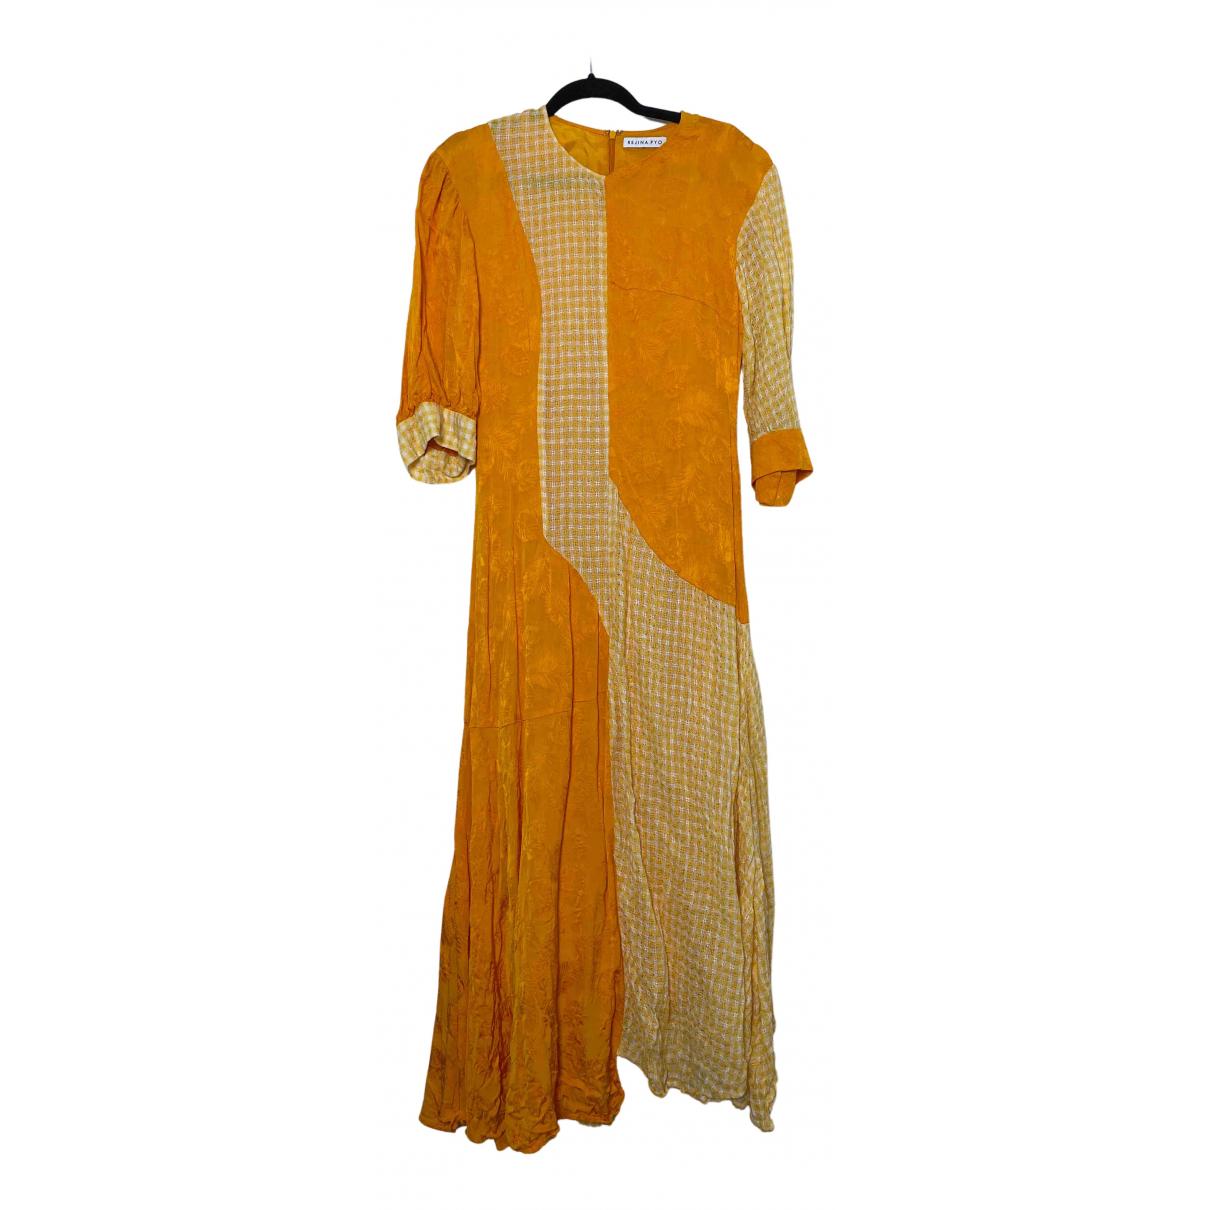 Rejina Pyo - Robe   pour femme en lin - jaune